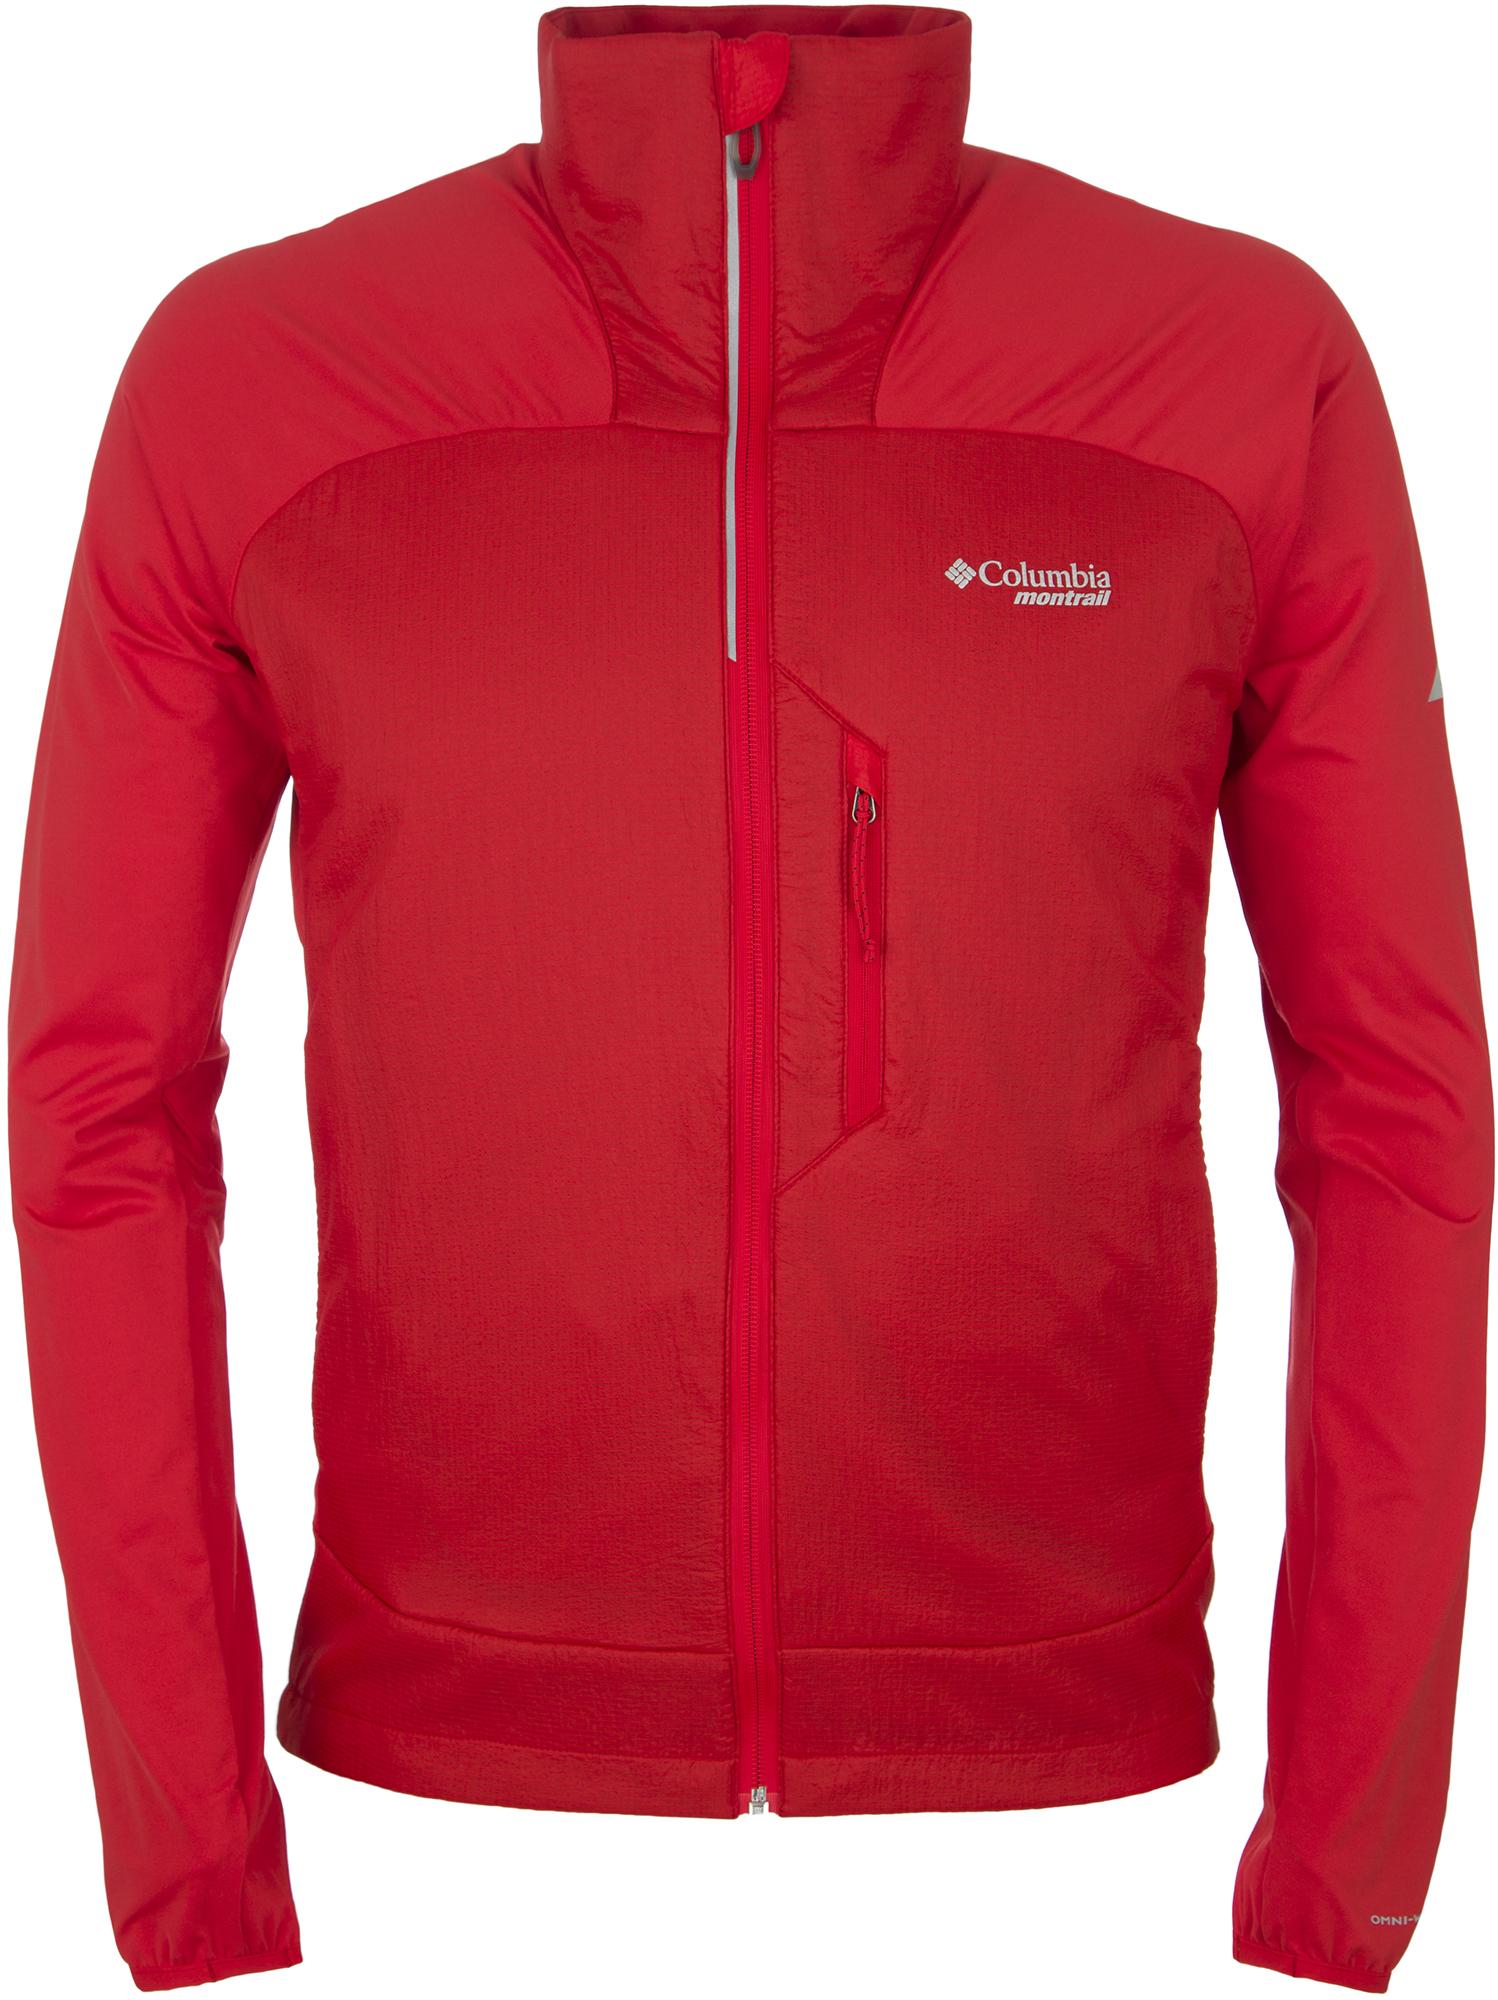 Columbia Куртка утепленная мужская Columbia Caldorado III, размер 56-58 цена и фото